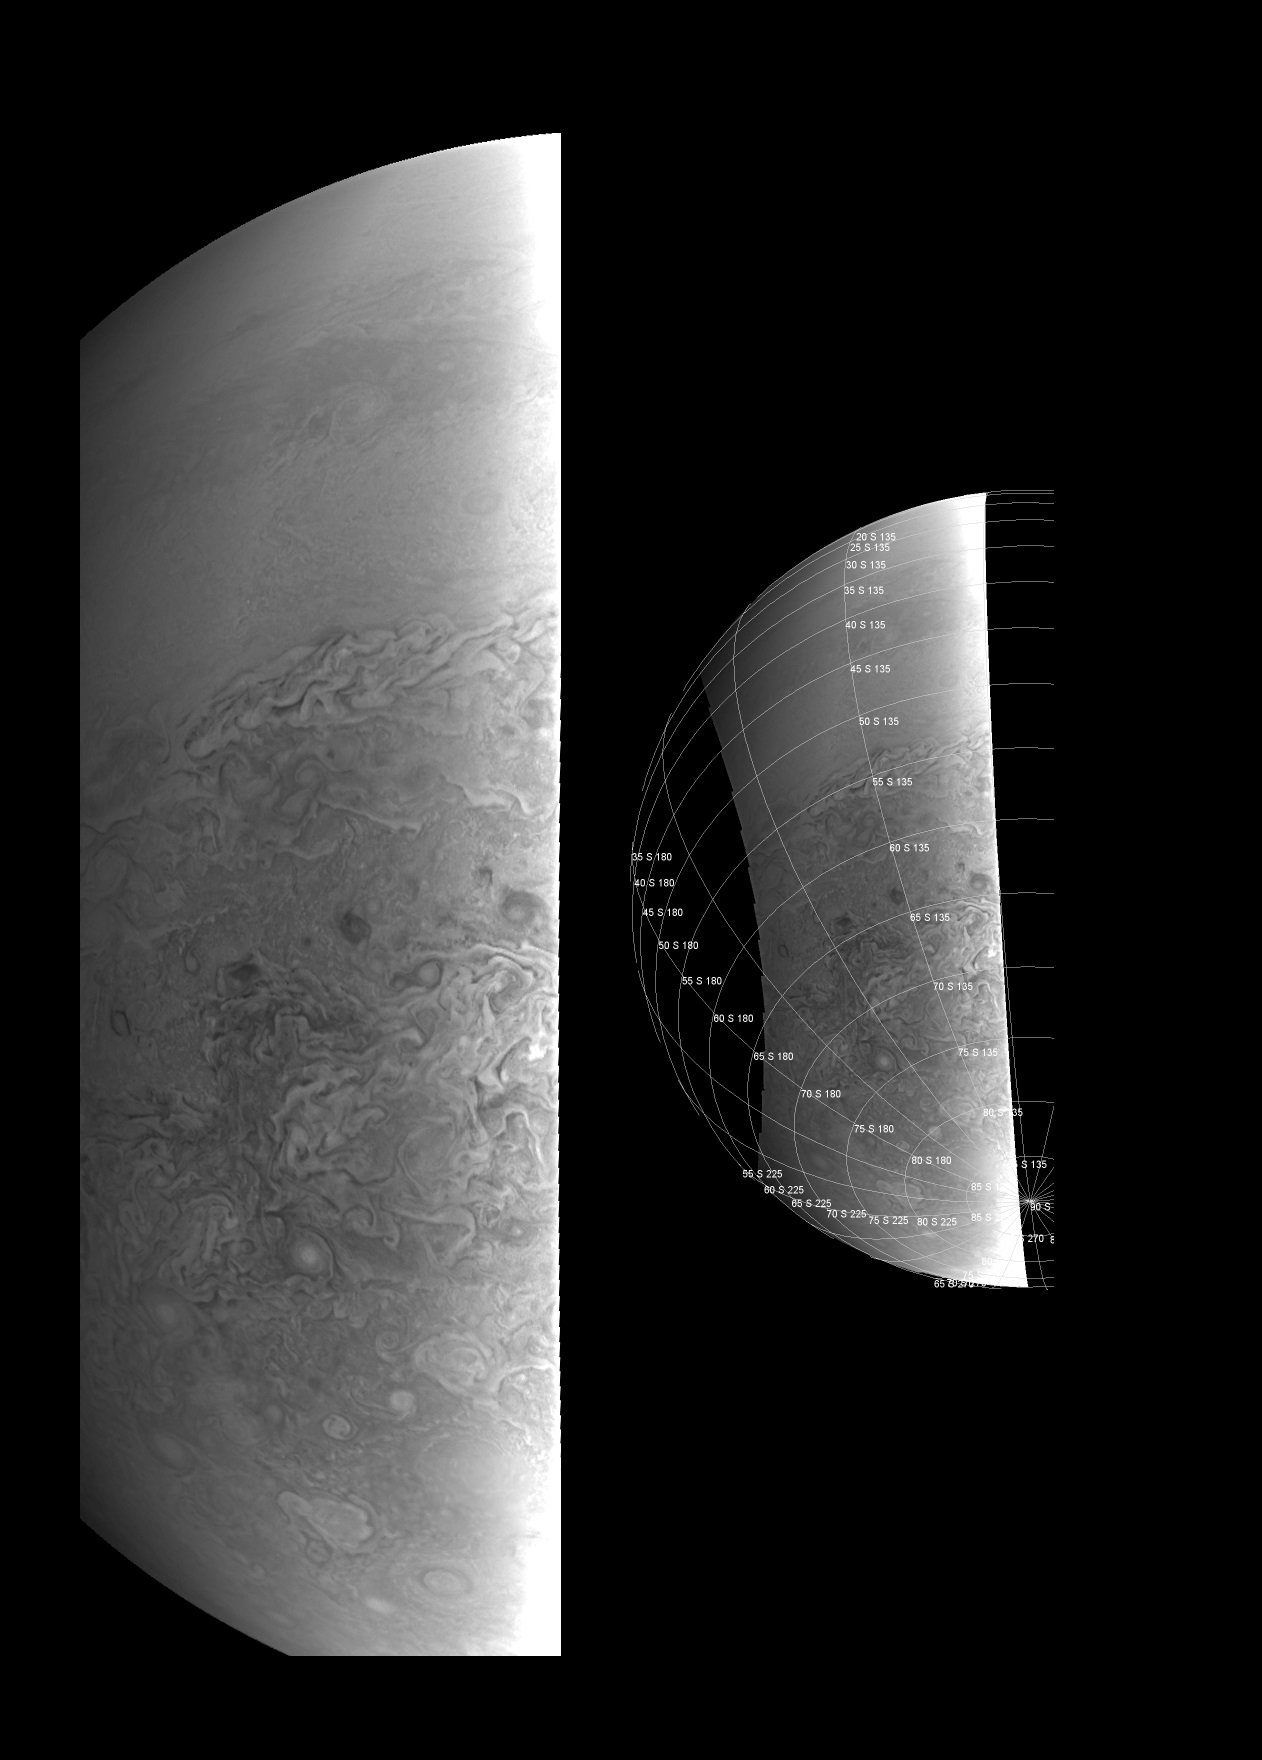 Southern Hemisphere from 38,000 Kilometers - Credit: NASA/JPL-Caltech/SwRI/MSSS